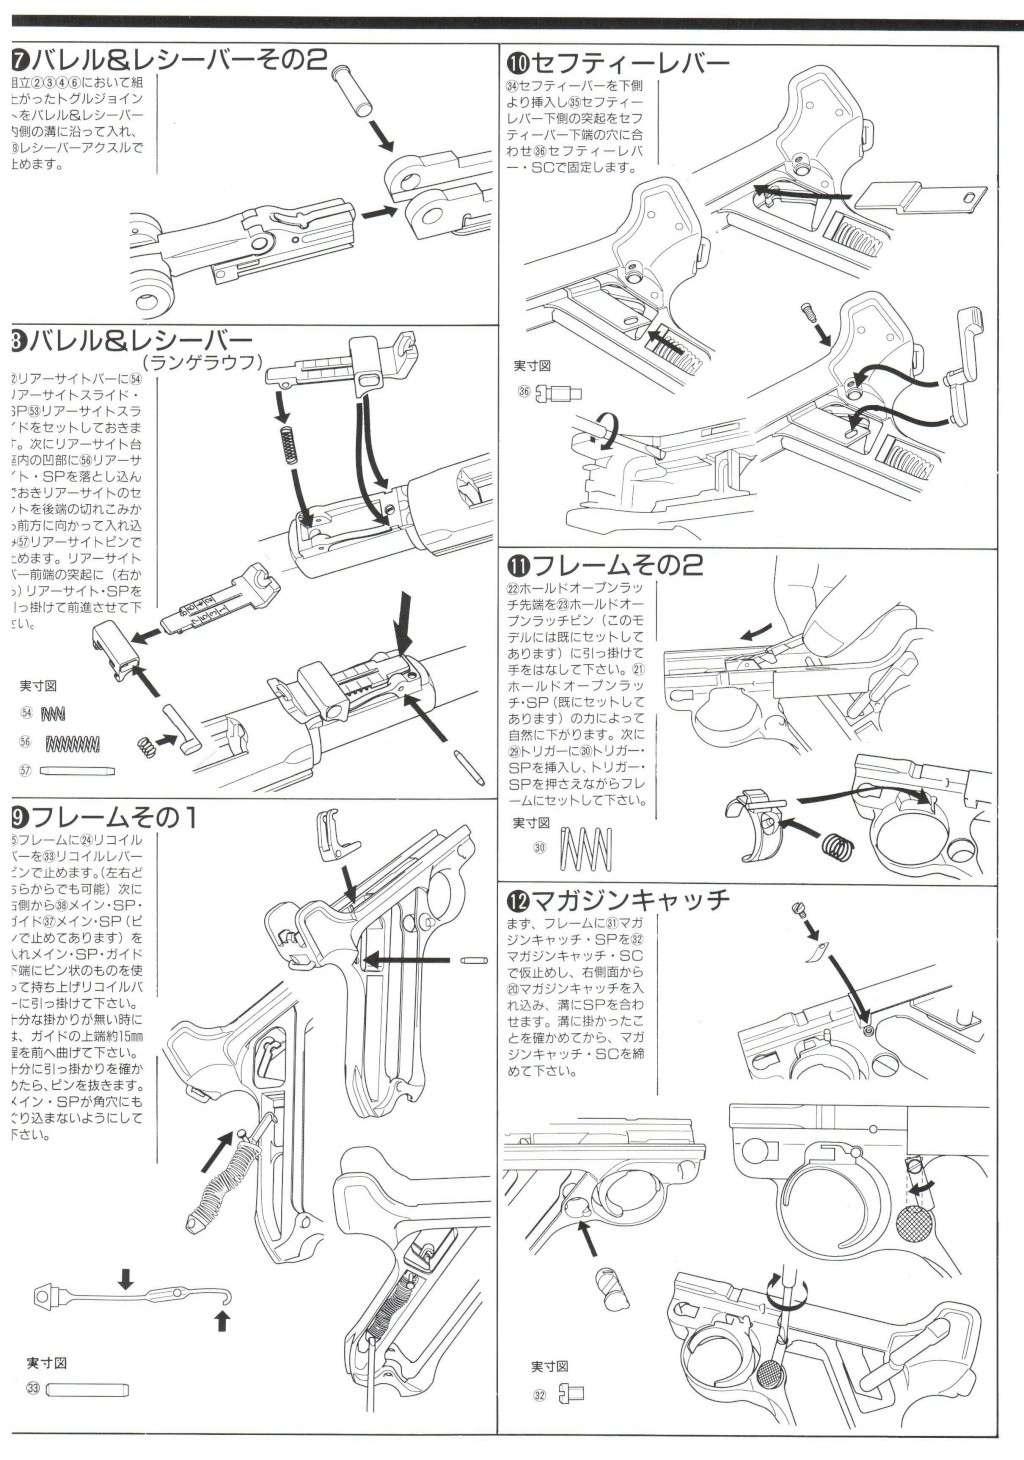 Marushin Metal KIT Dummy Cartridge Model LUGER P08 cal. 9 mm Instruction Manual D10